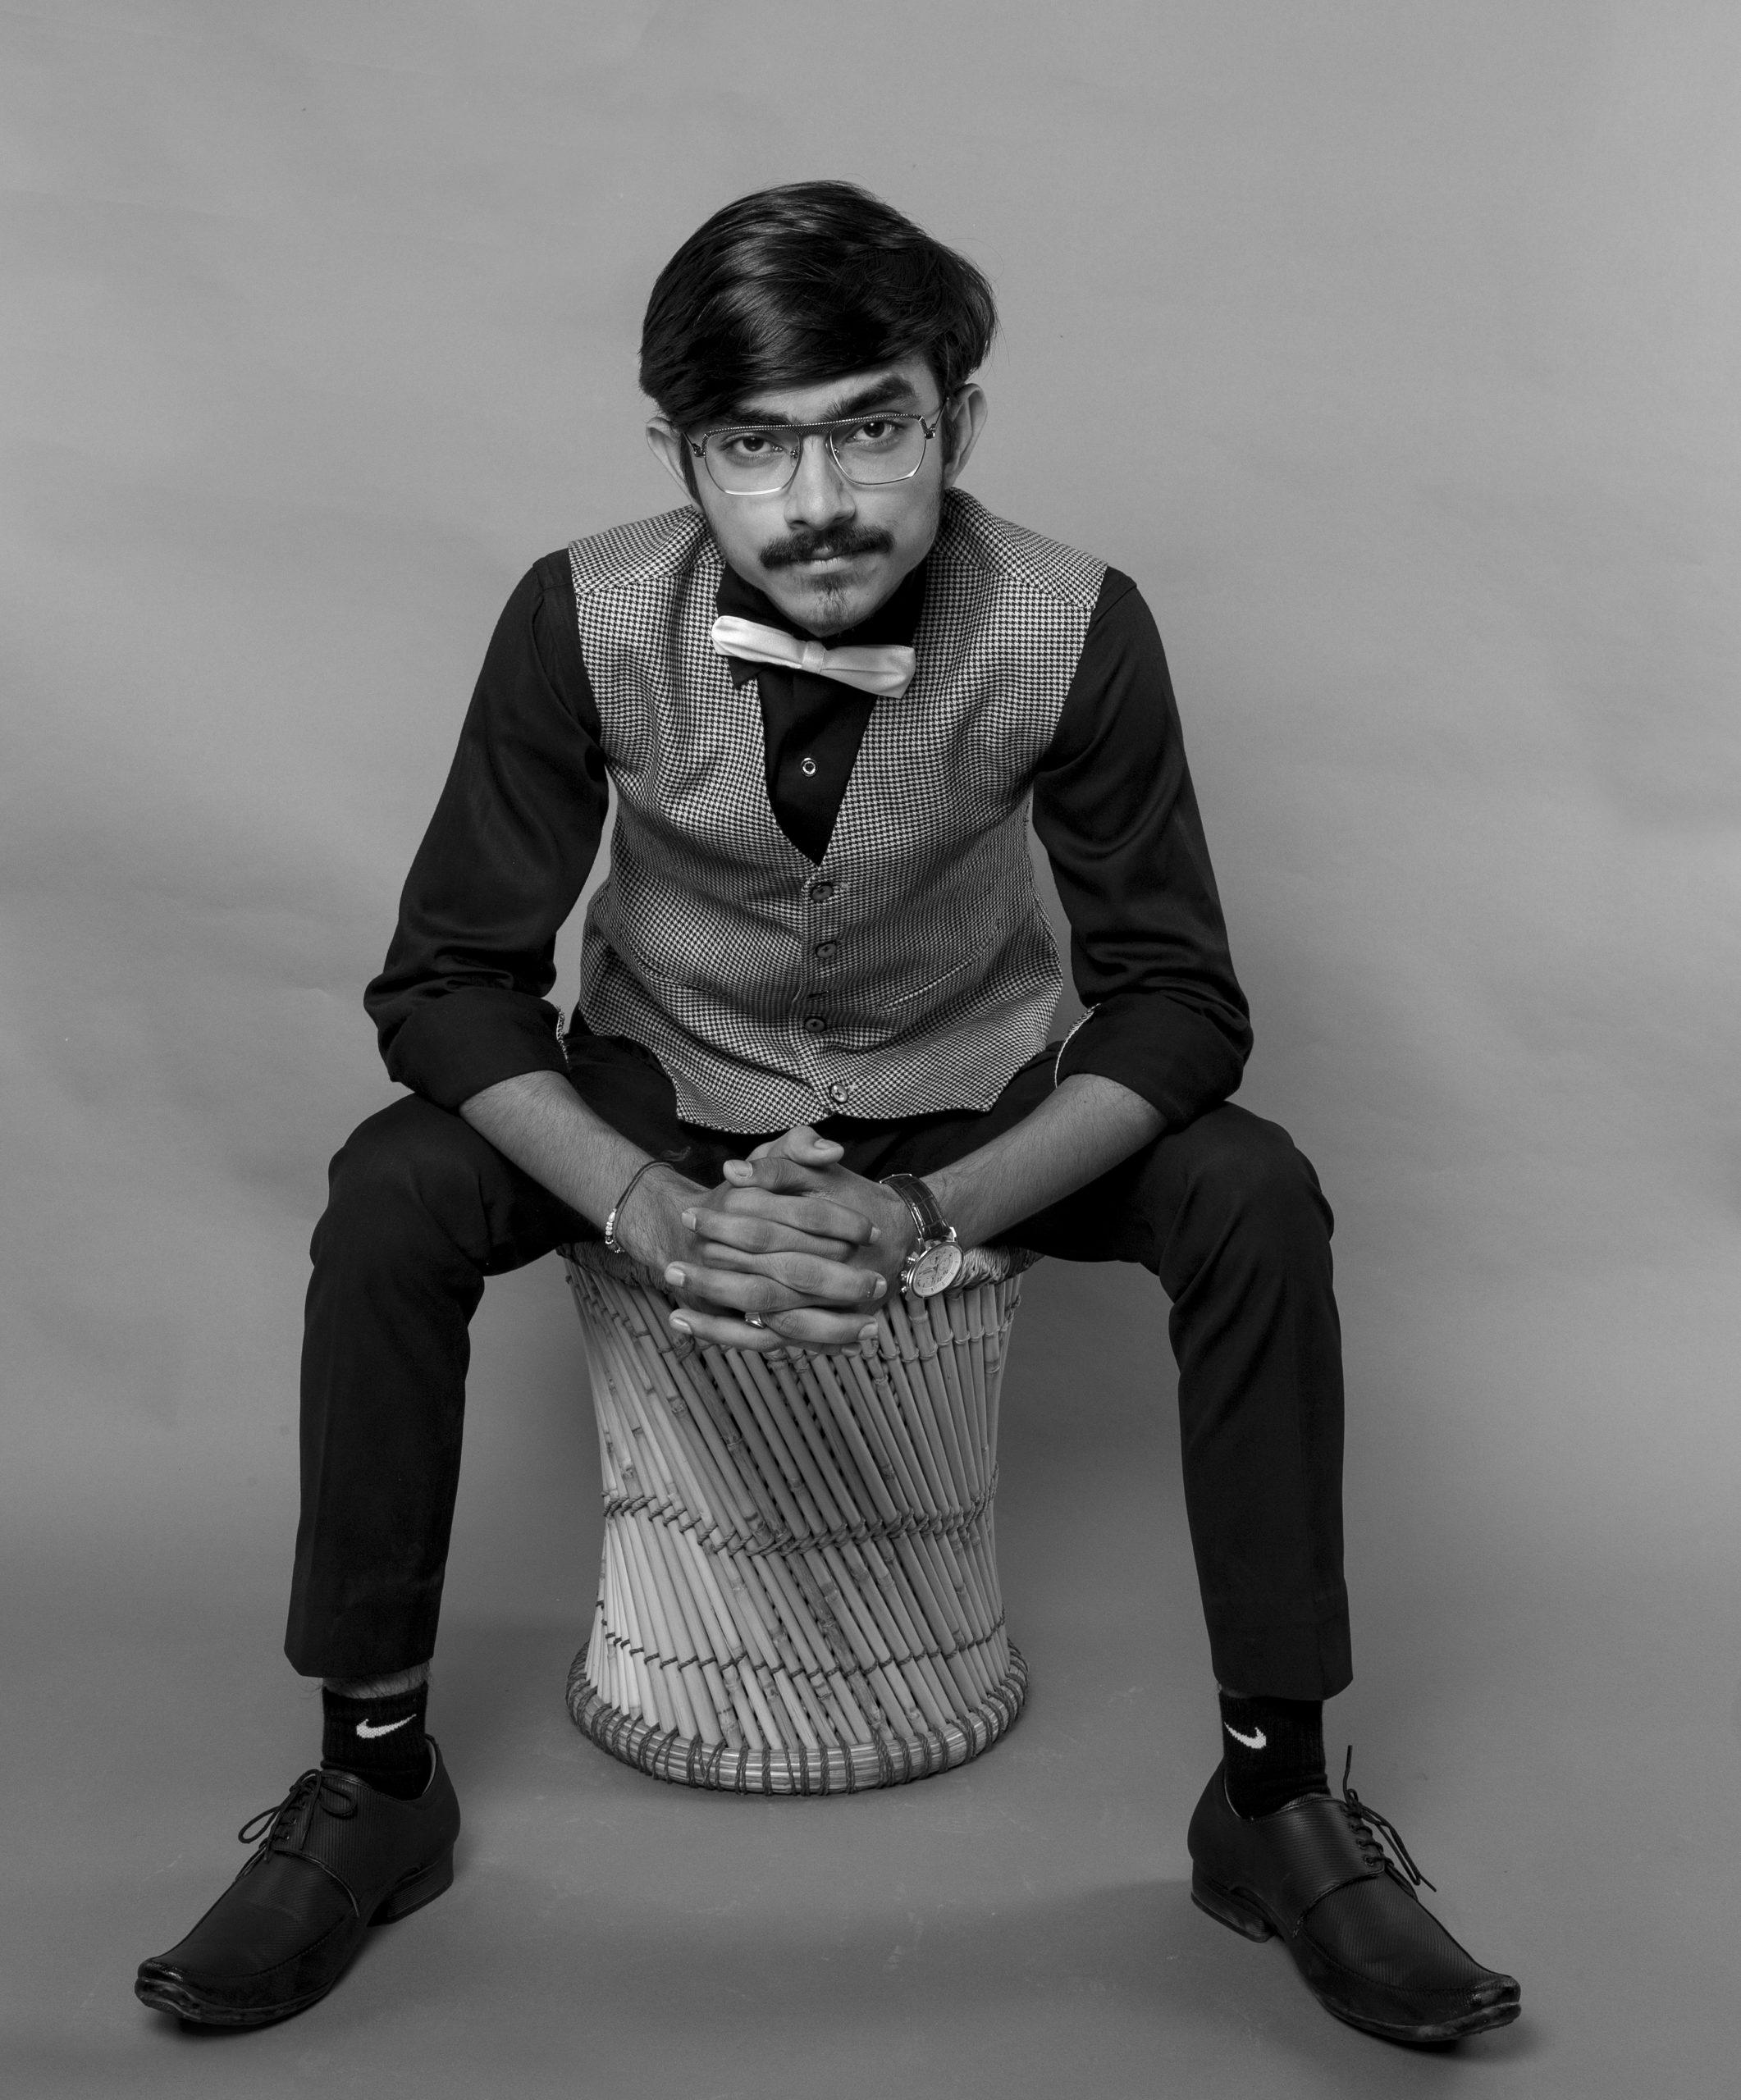 Gujarat Based entrepreneur Abhishek Panara is Ready to Launch India's first Indian Platform Provider – Lappen